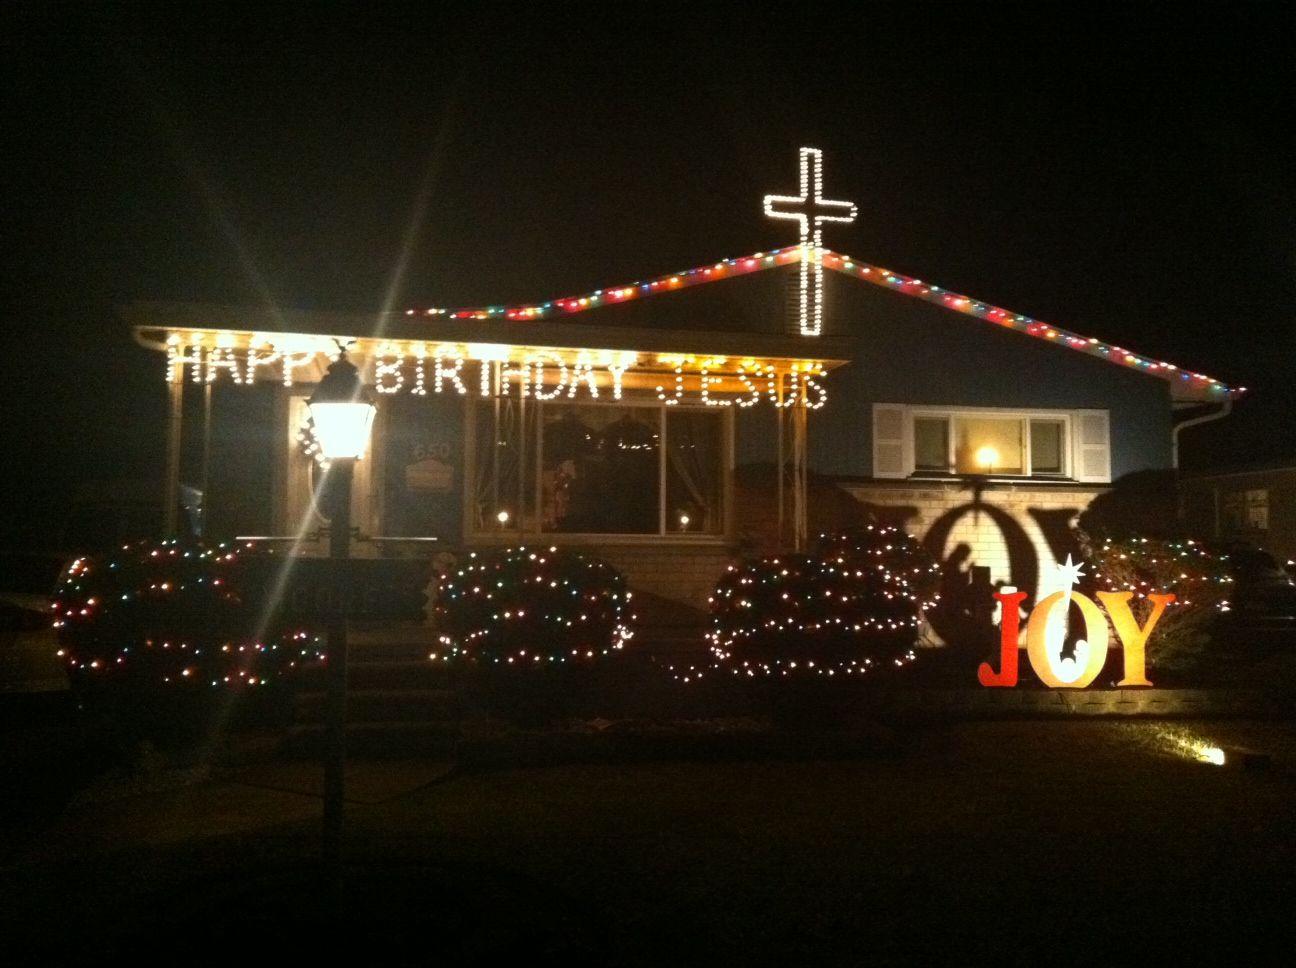 Happy Birthday Jesus! Happy birthday jesus, Happy